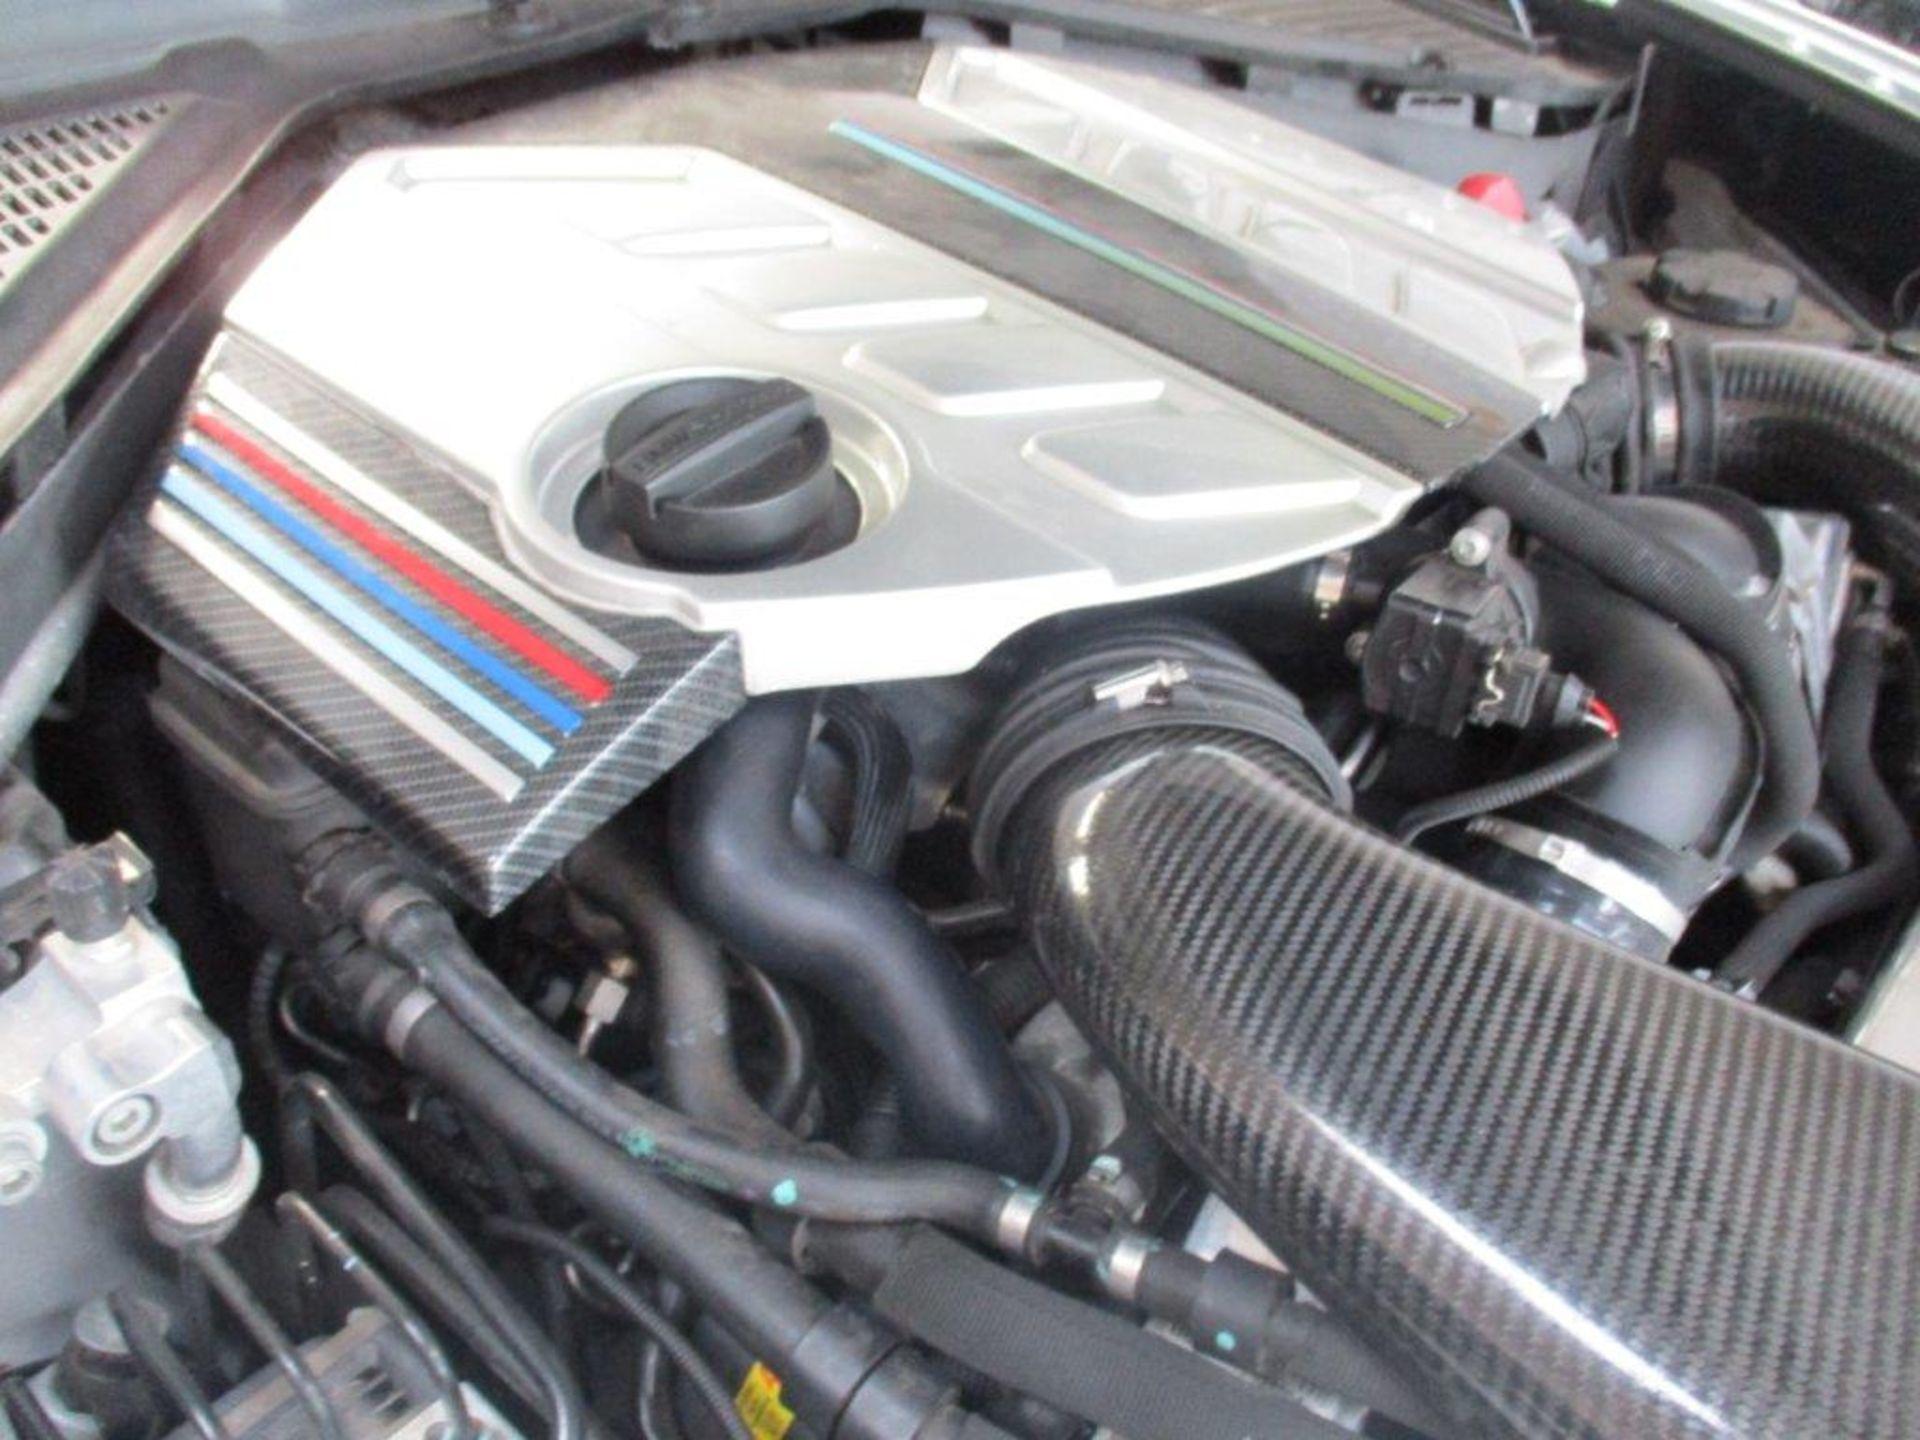 60 10 BMW X5 M Turbo Auto - Image 14 of 35